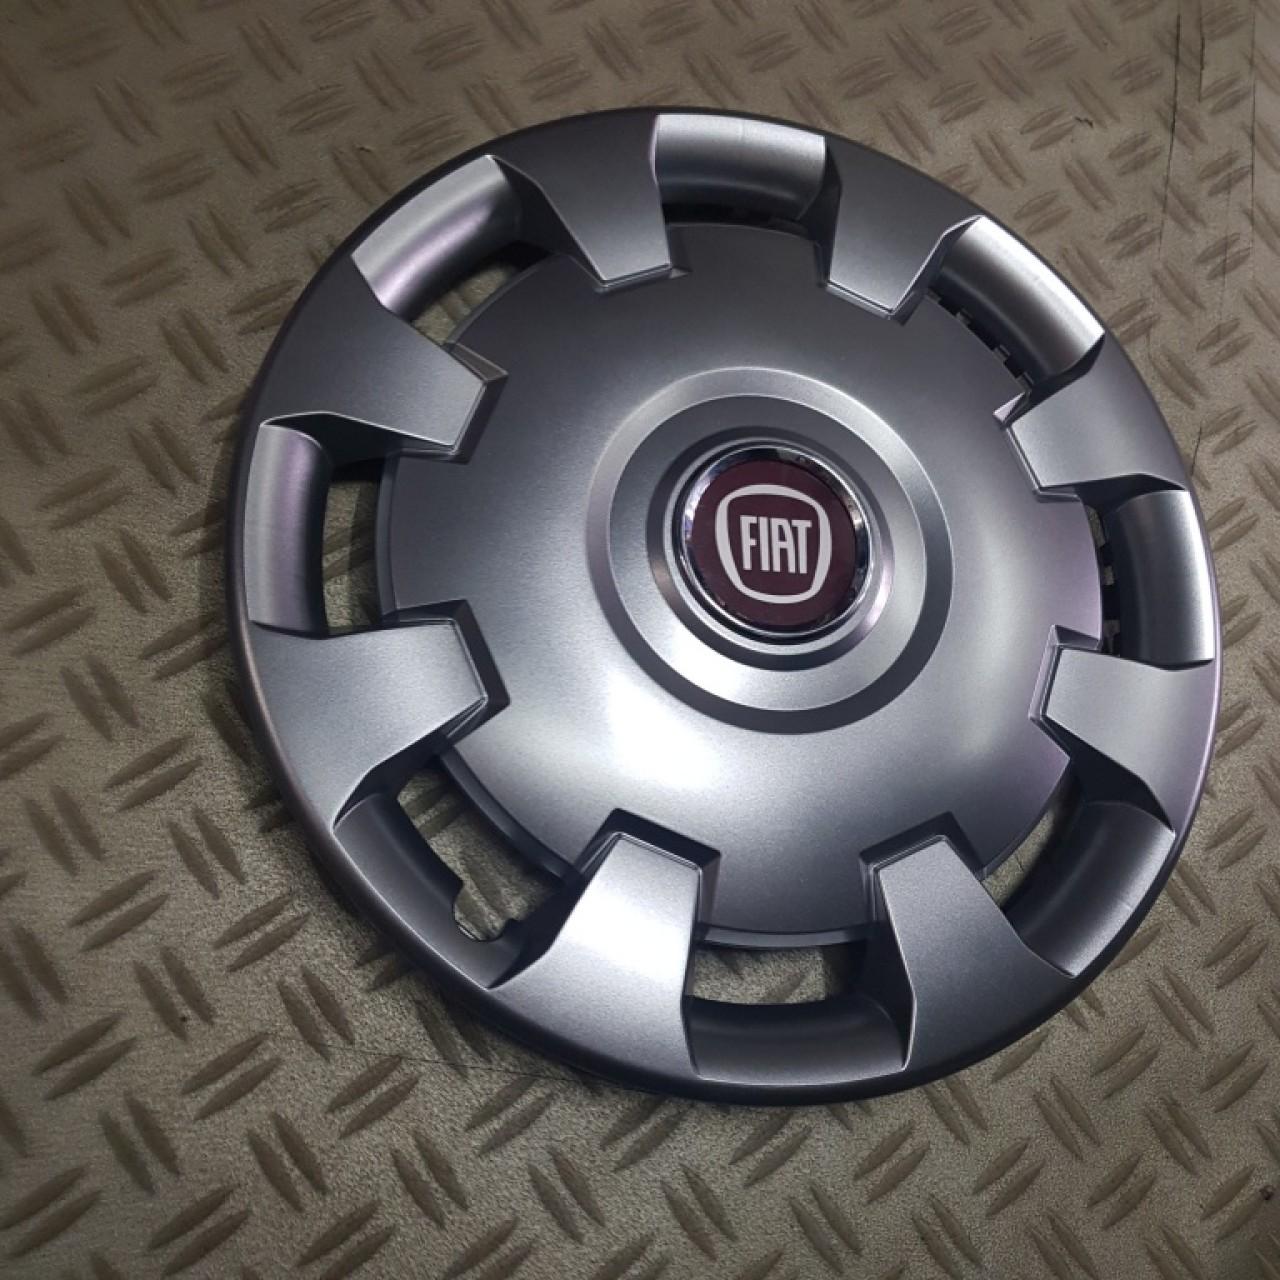 Capace roti Fiat r13 la set de 4 bucati cod 111